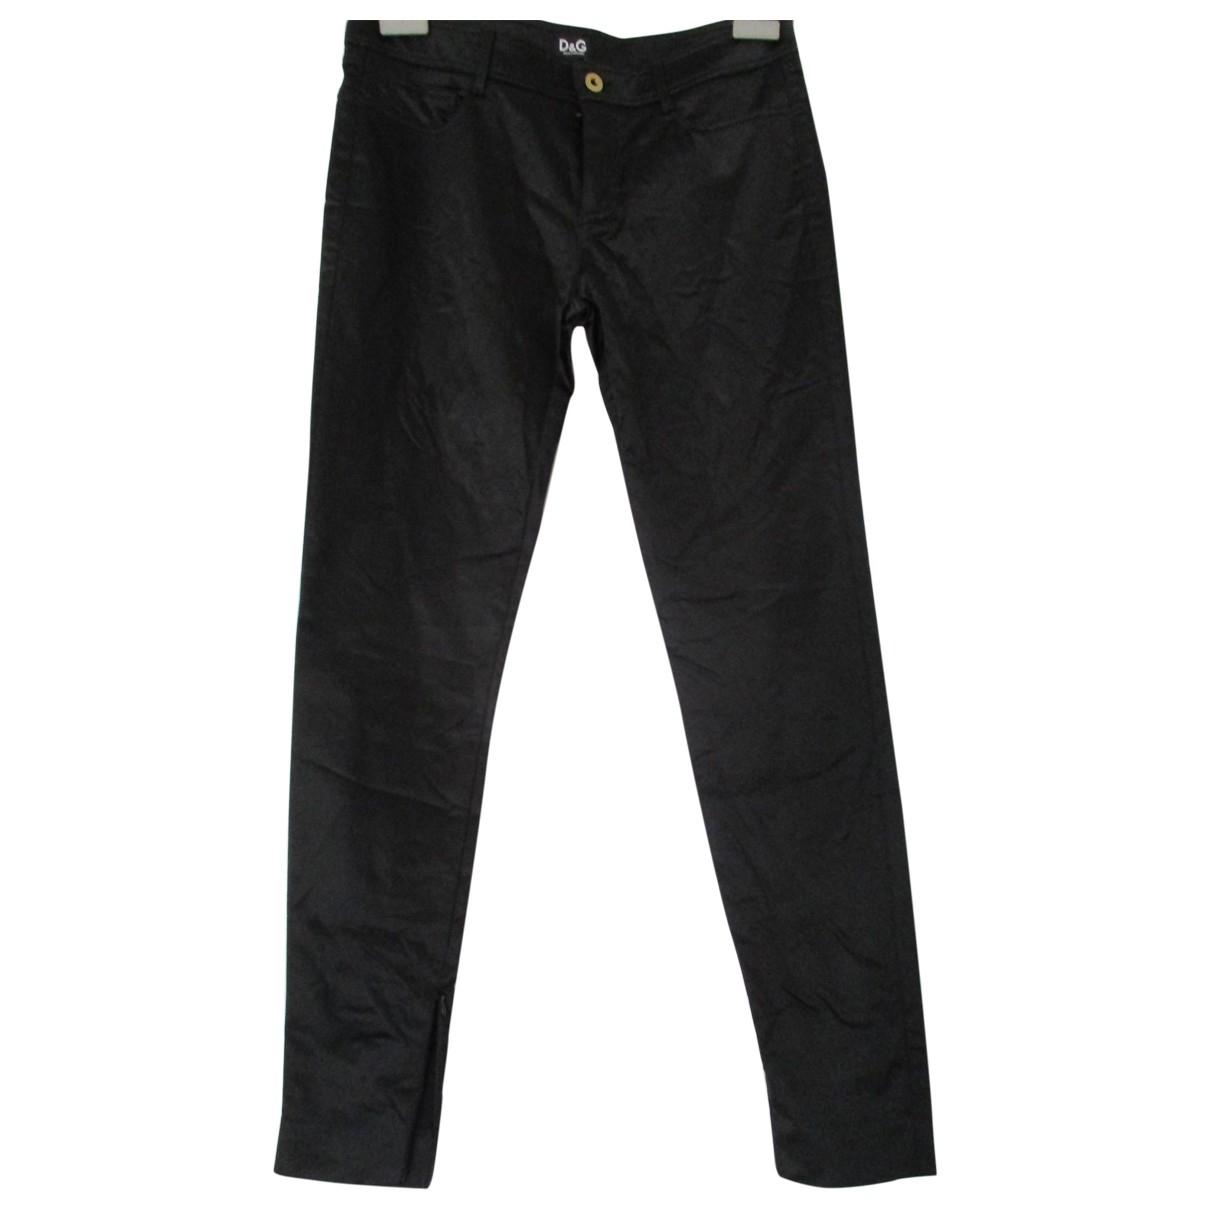 D&g \N Black Spandex Trousers for Women 42 IT